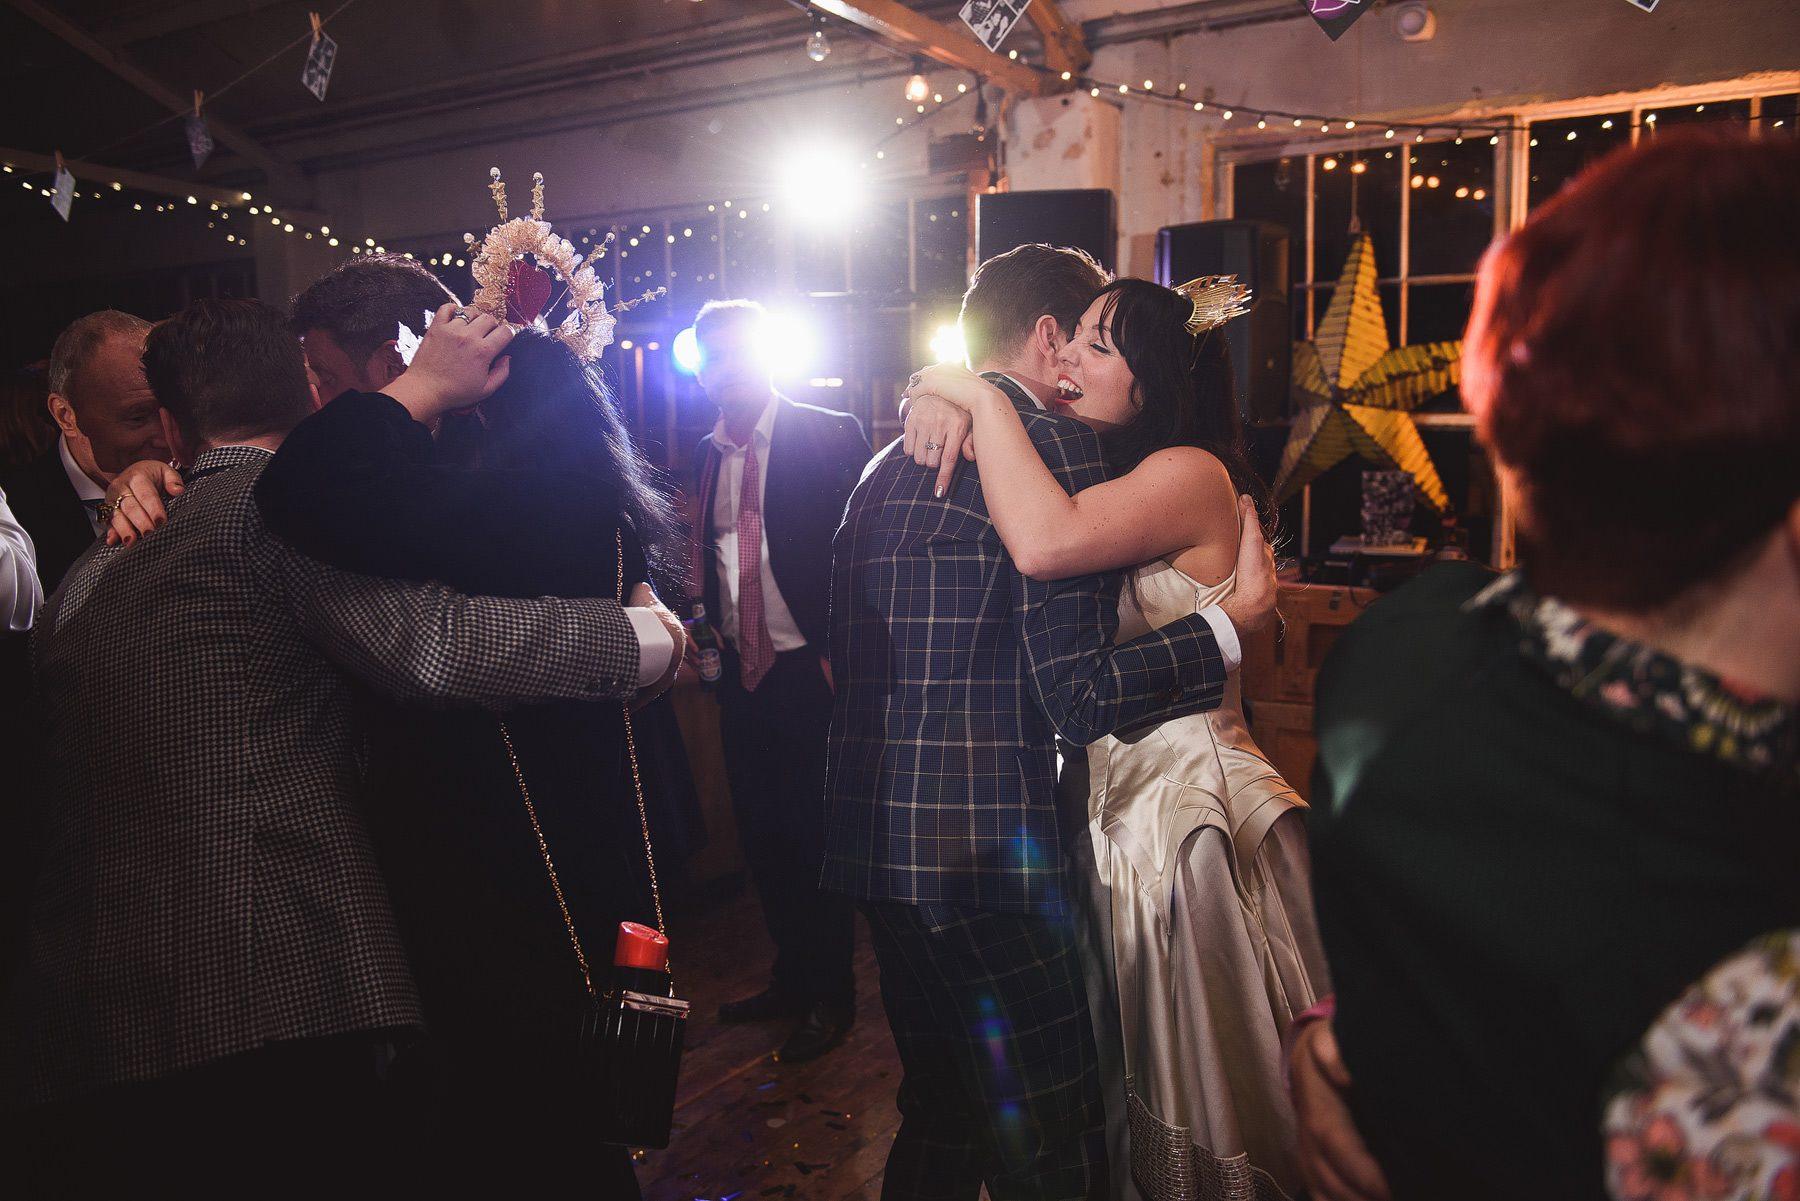 dalston heights wedding dancing